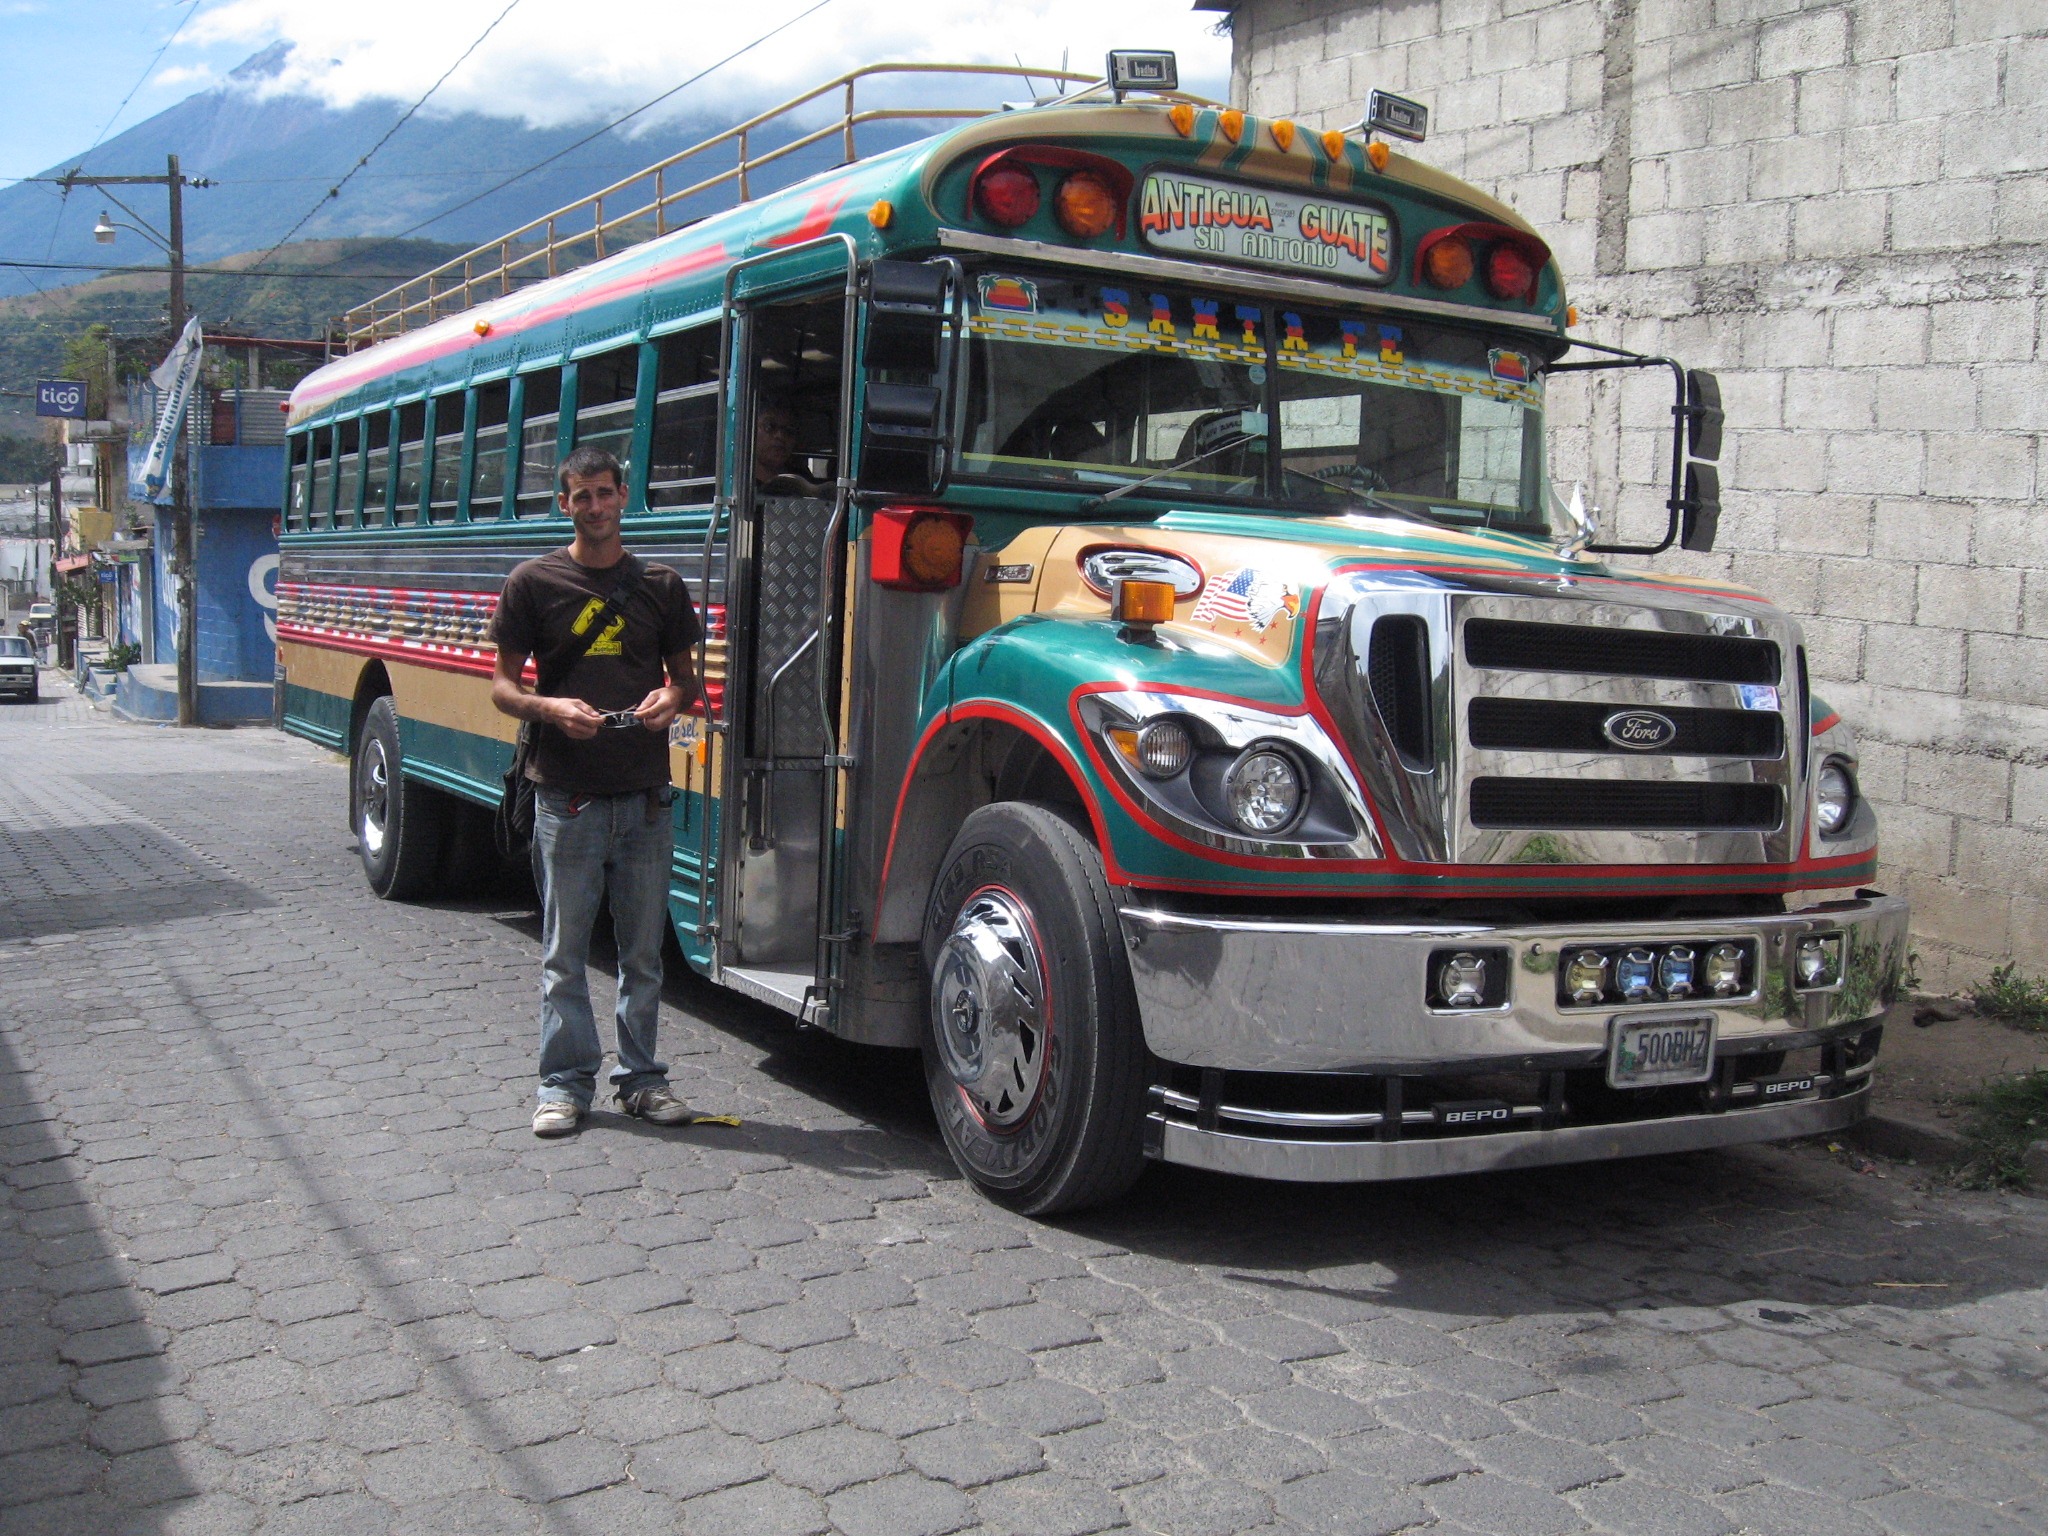 Chickenbus du Guatémala